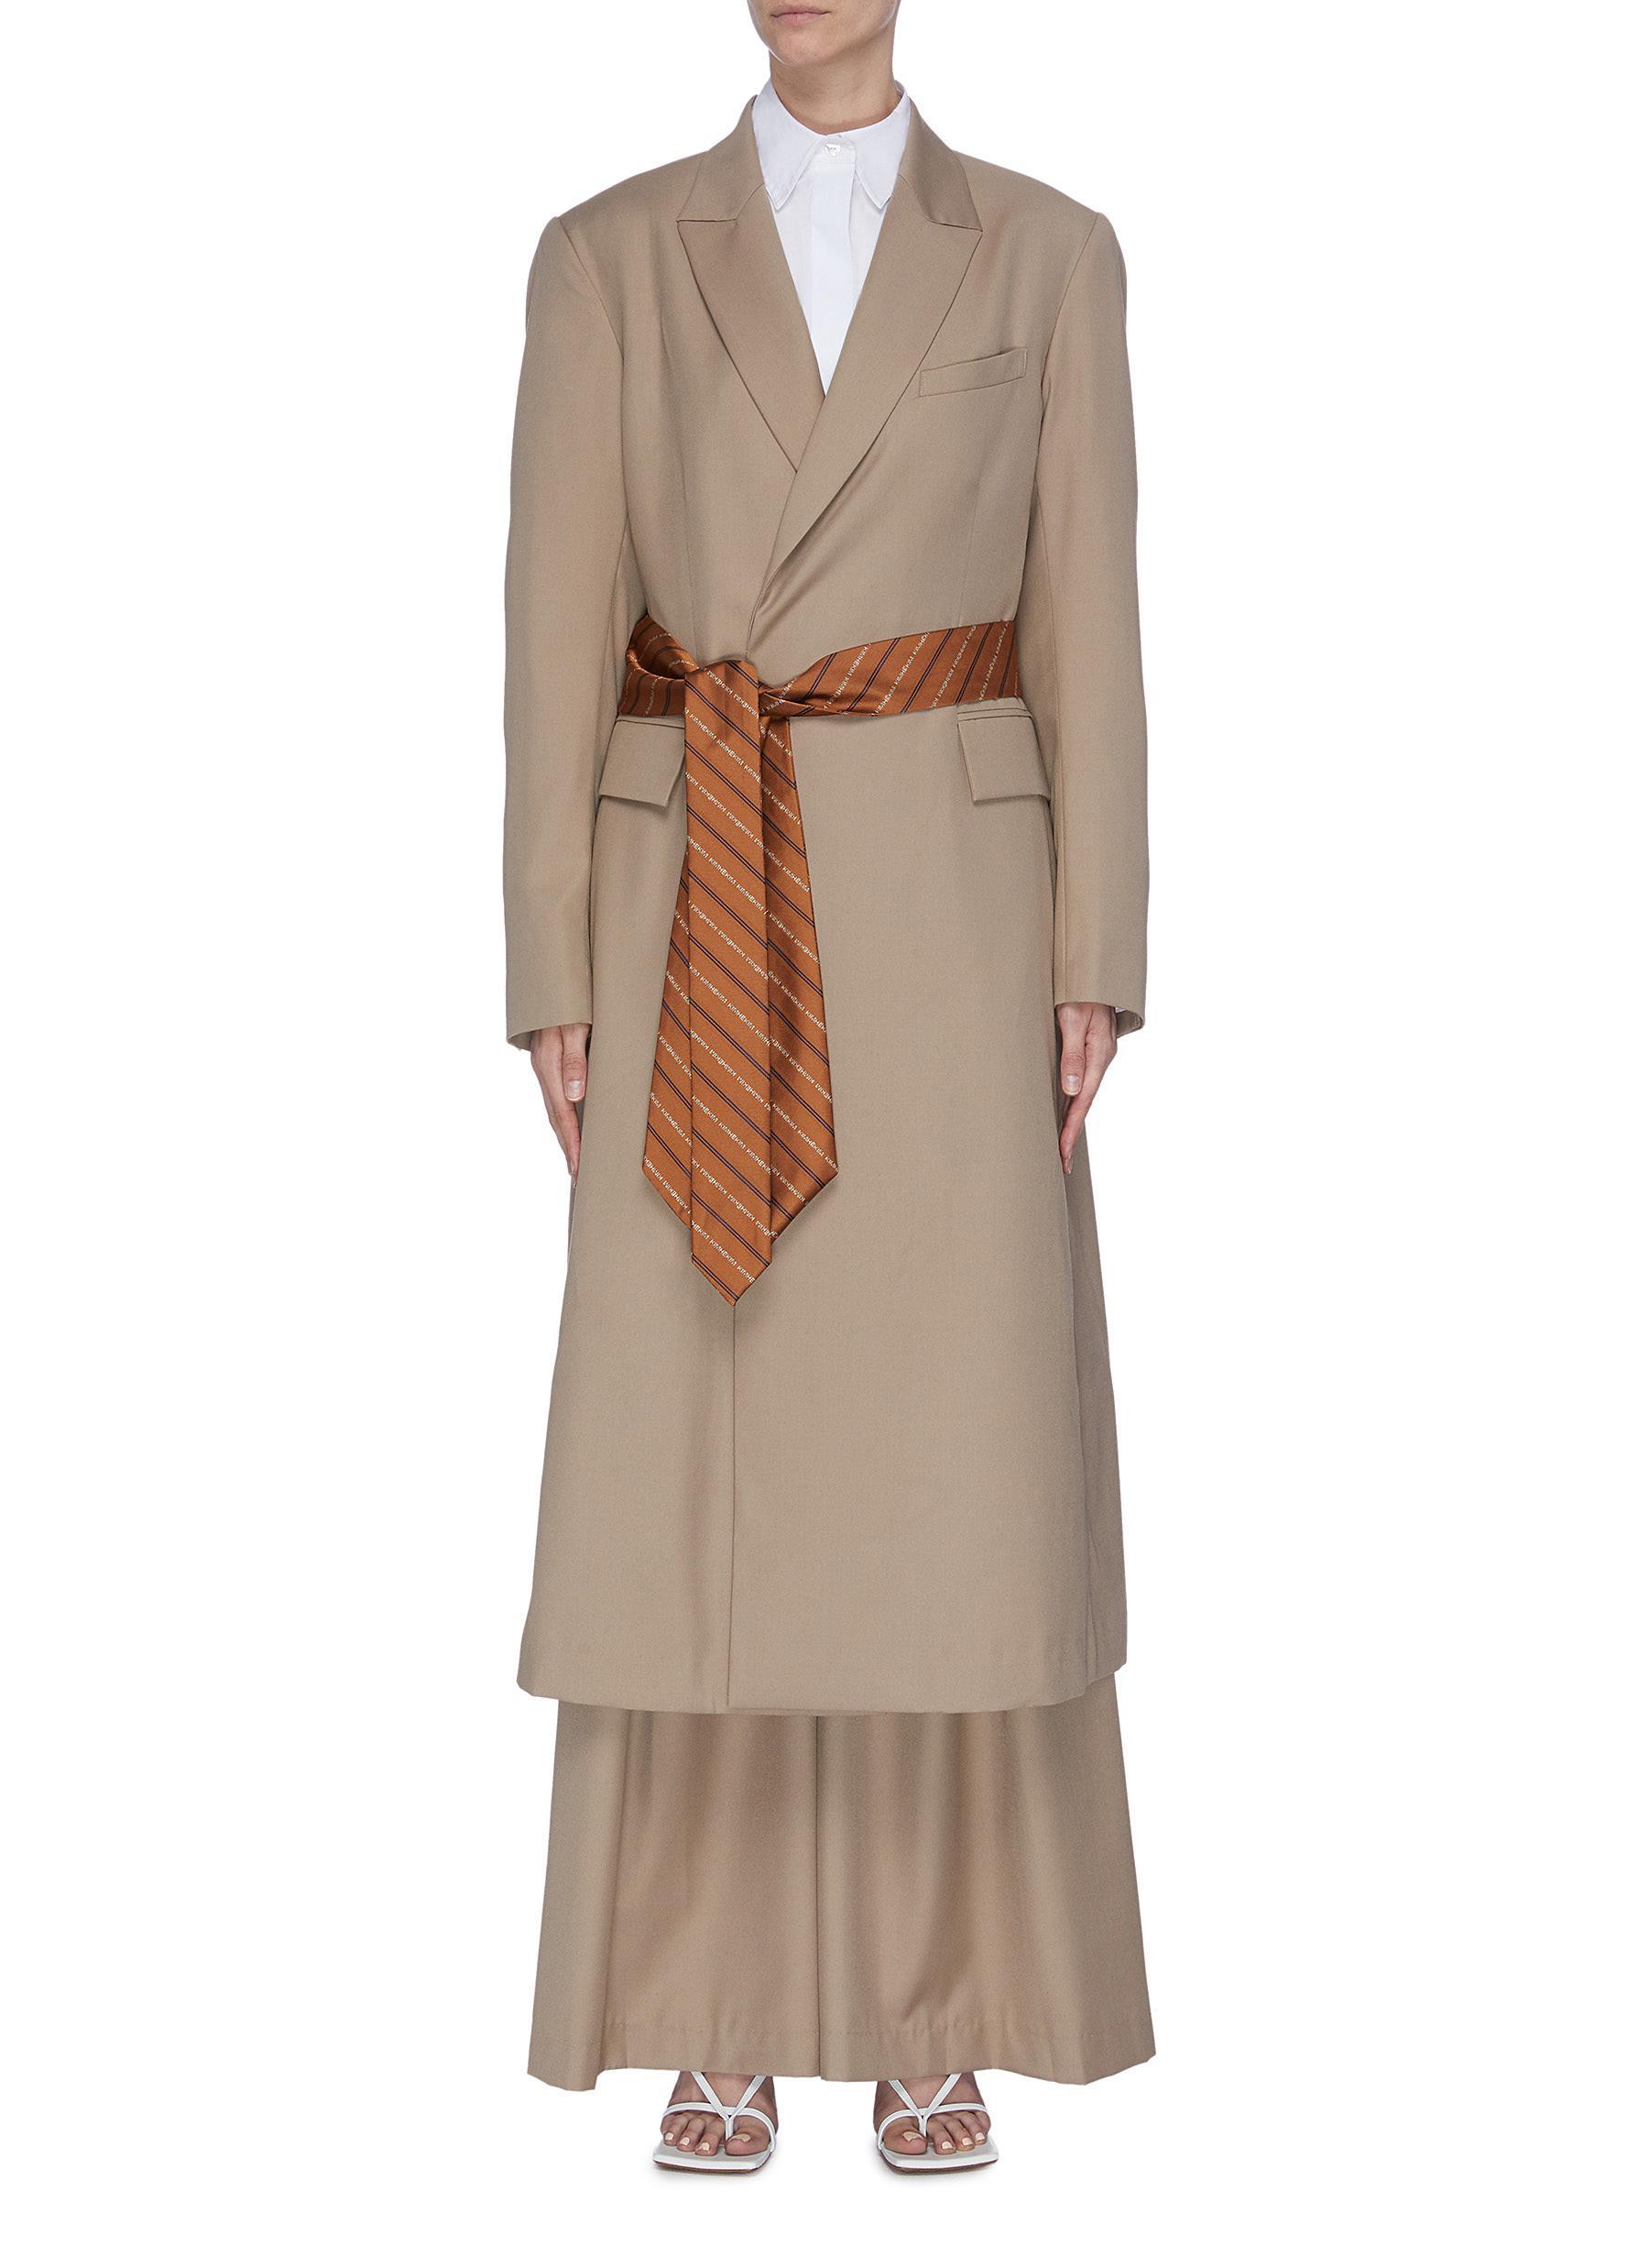 Belted coat dress by Kimhekim